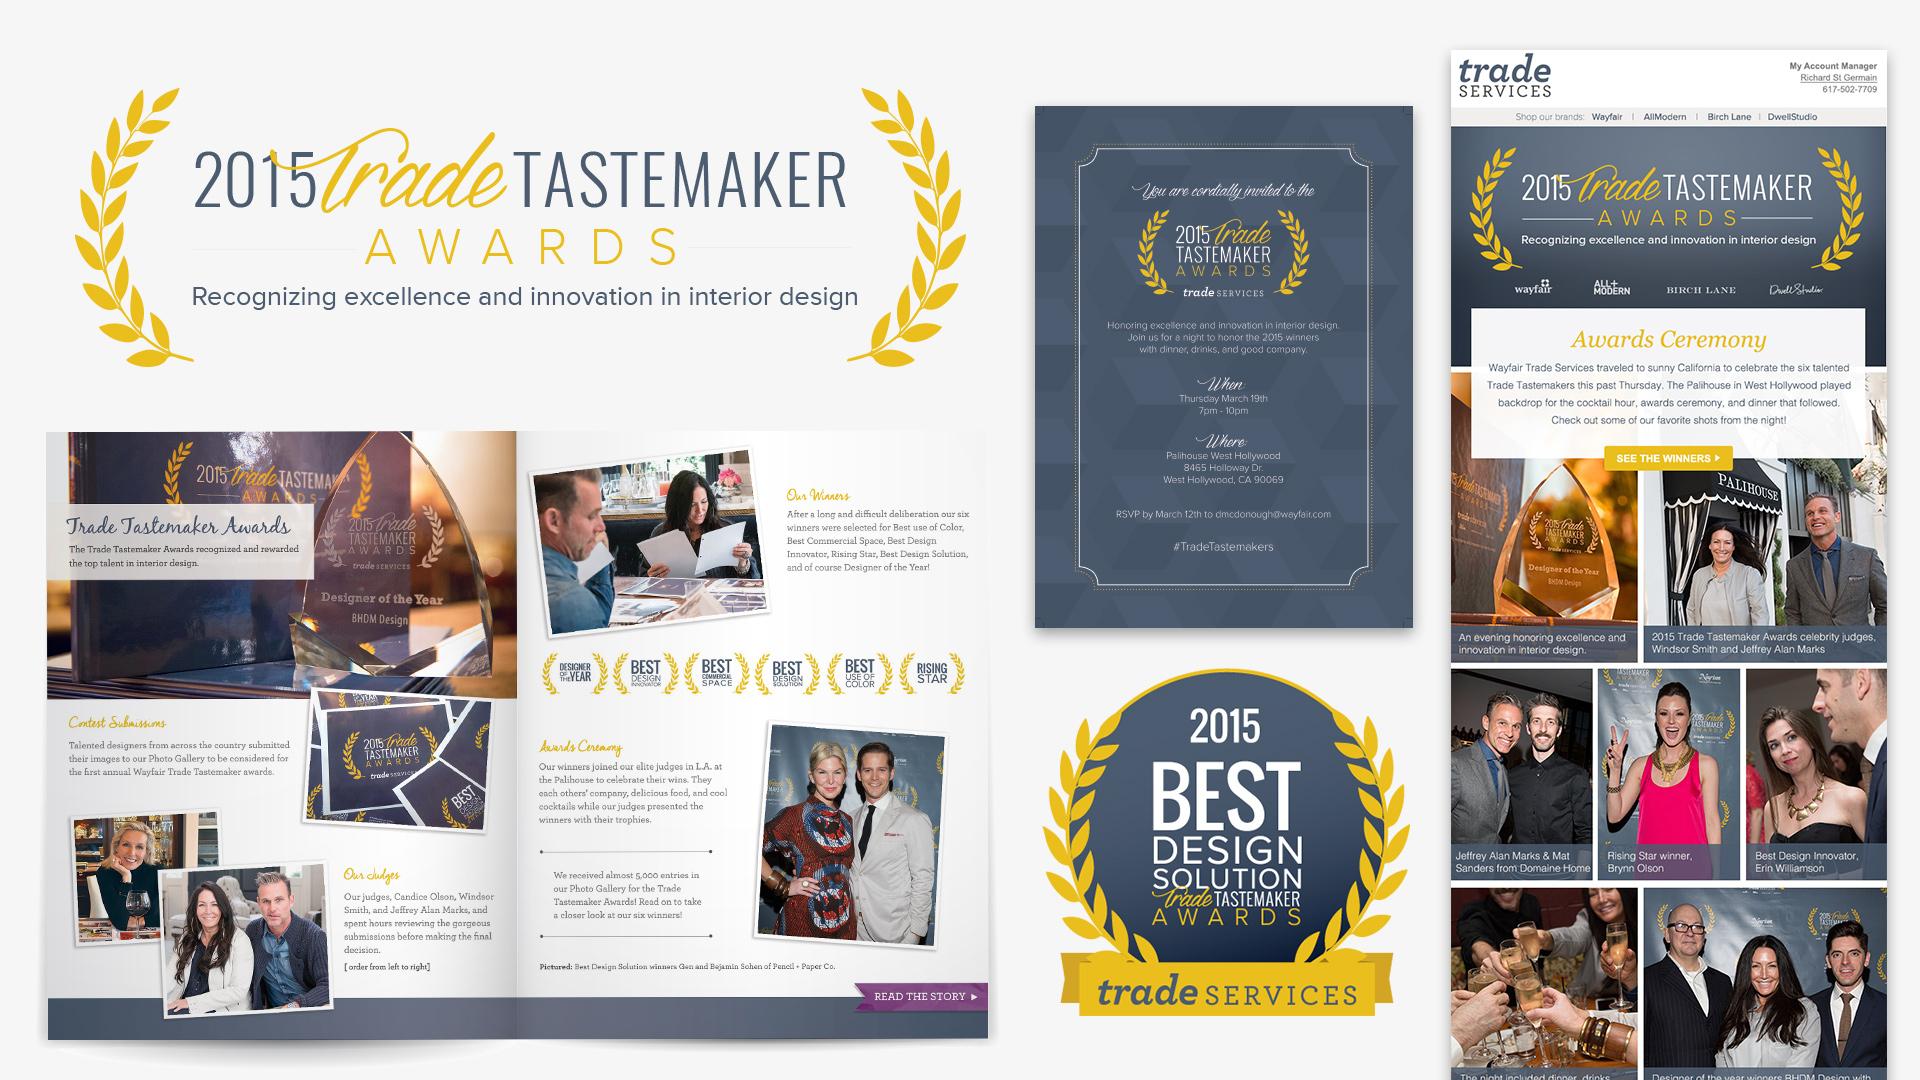 WayfairTrade_Tastemaker_Hero.jpg